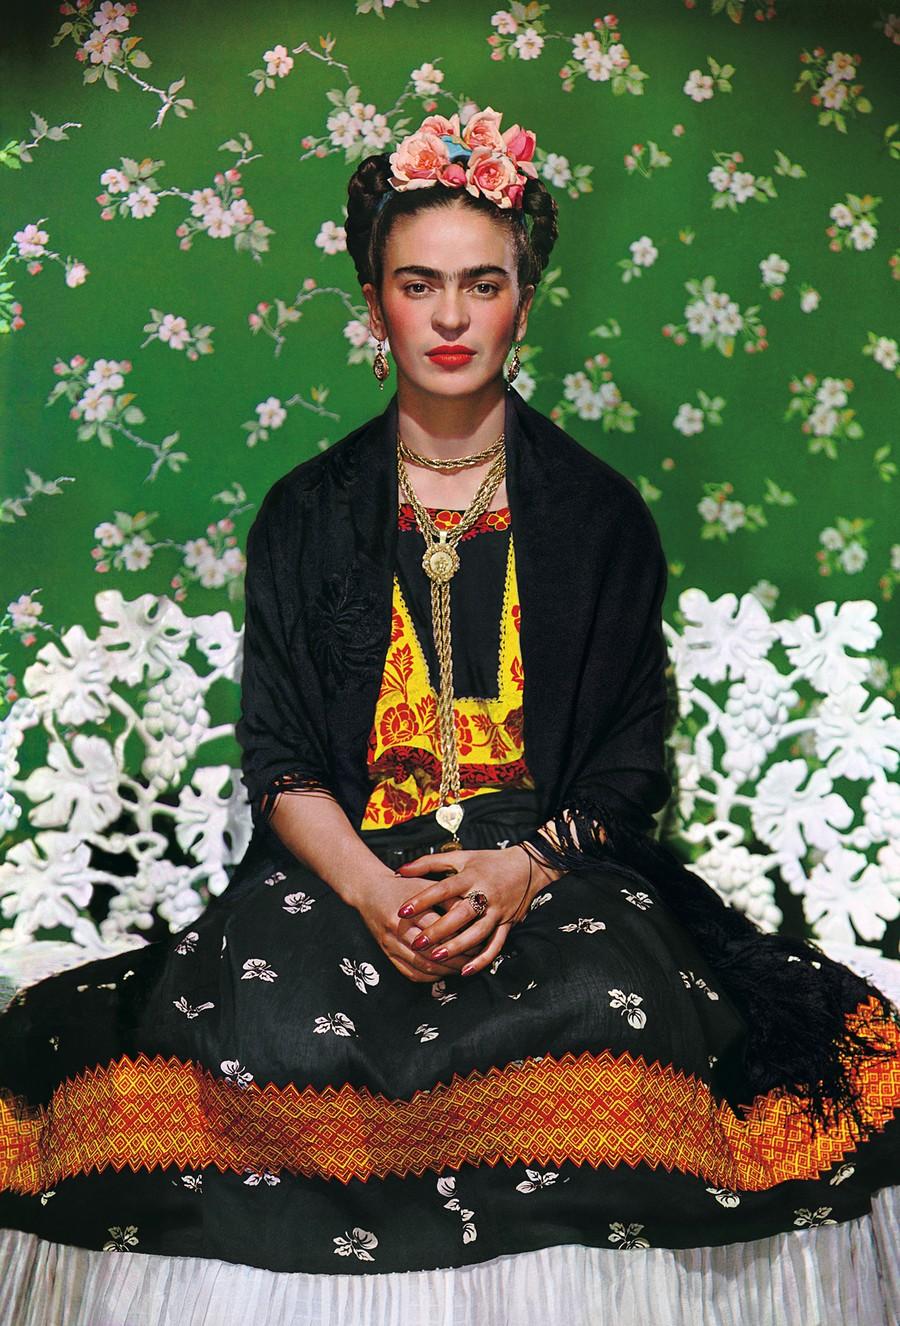 Nickolas Muray, Frida Kahlo on White Bench, New York (2nd Edition), photograph, 1939